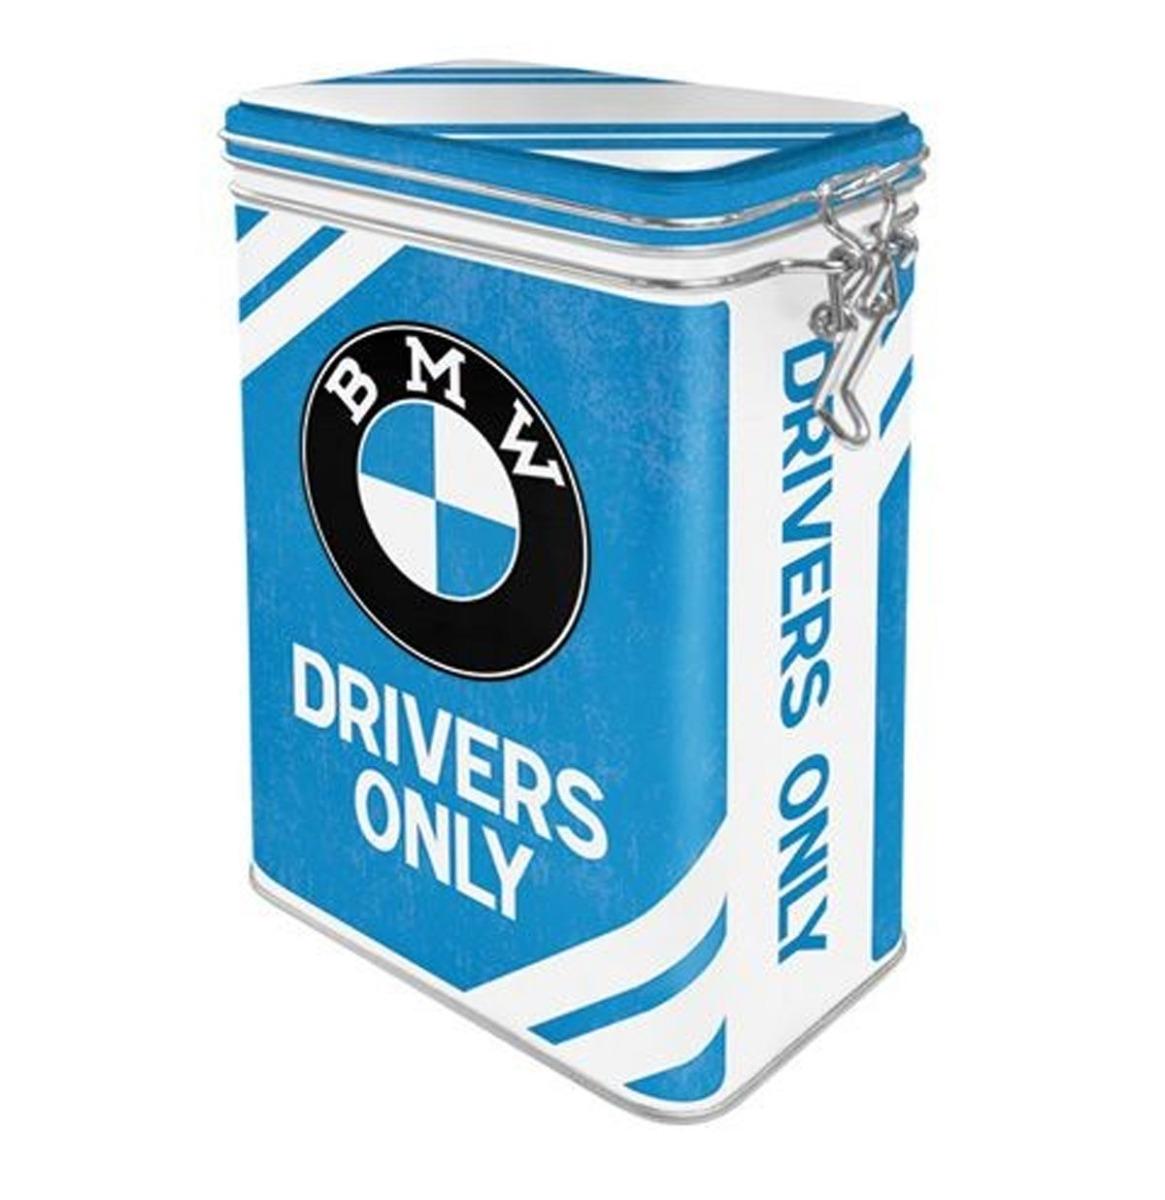 BMW Drivers Only Tinnen Blik Met Klipsluiting